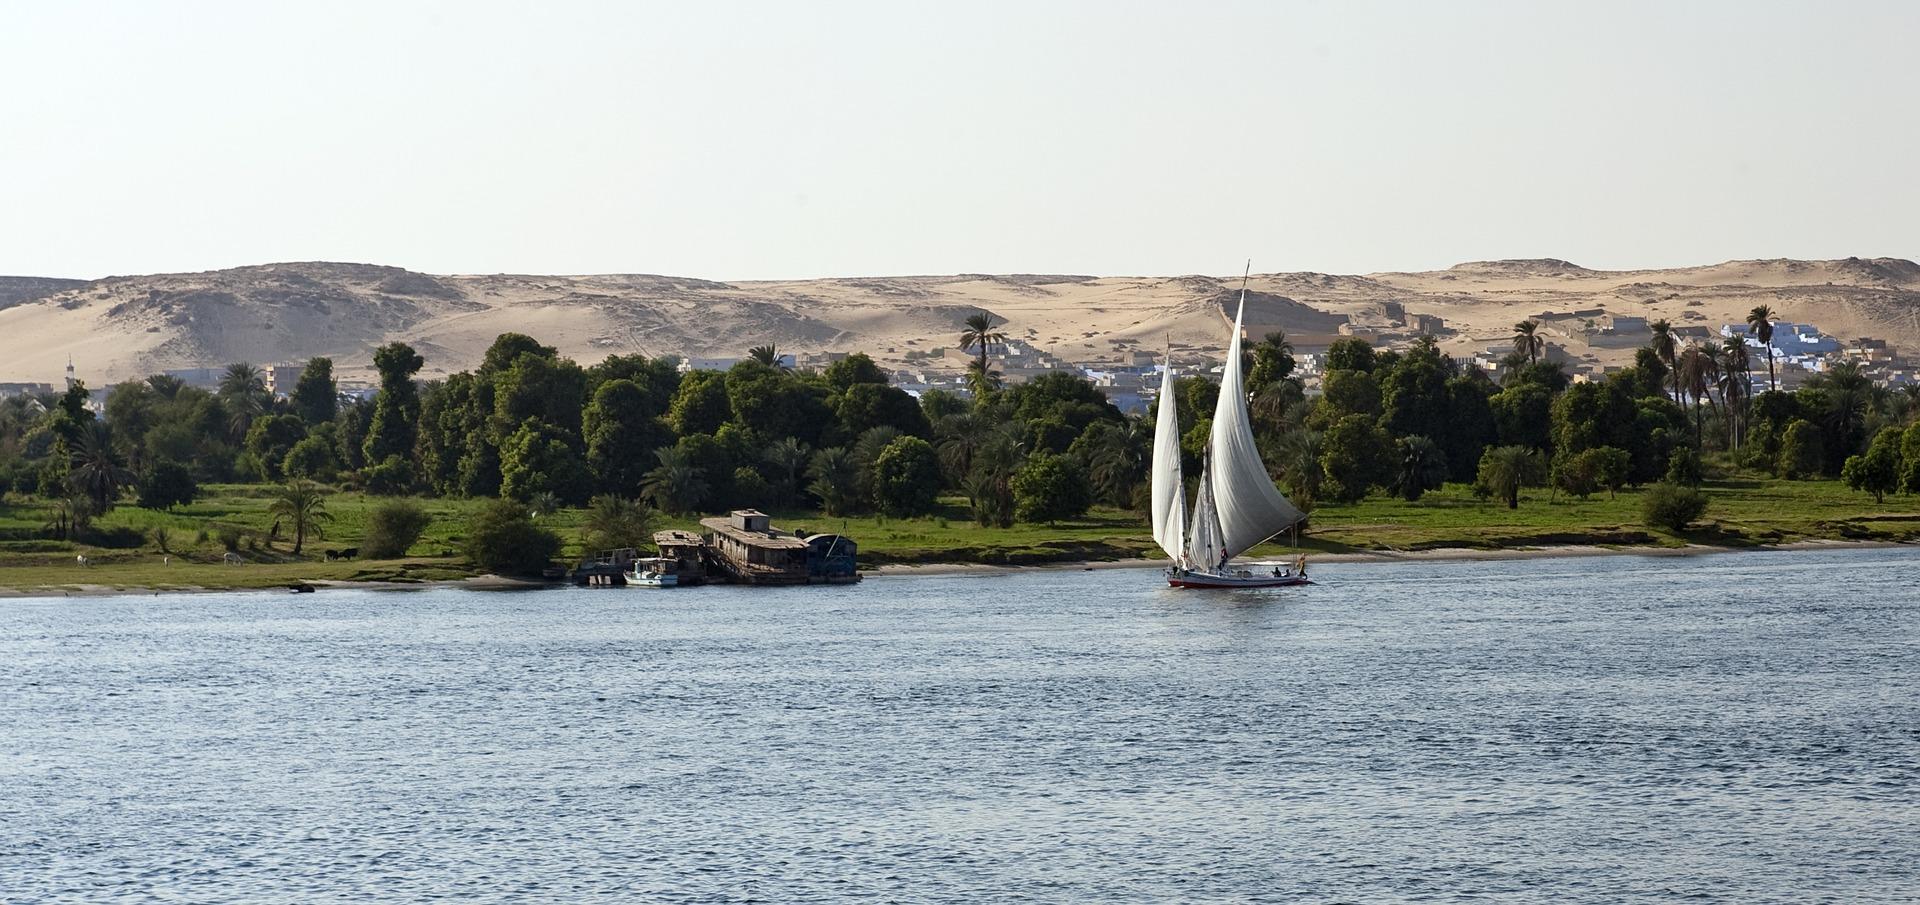 Nilkreuzfahrt Vollpension günstig ab 99,00€ - Ägypten Rundreise als Kreuzfahrt